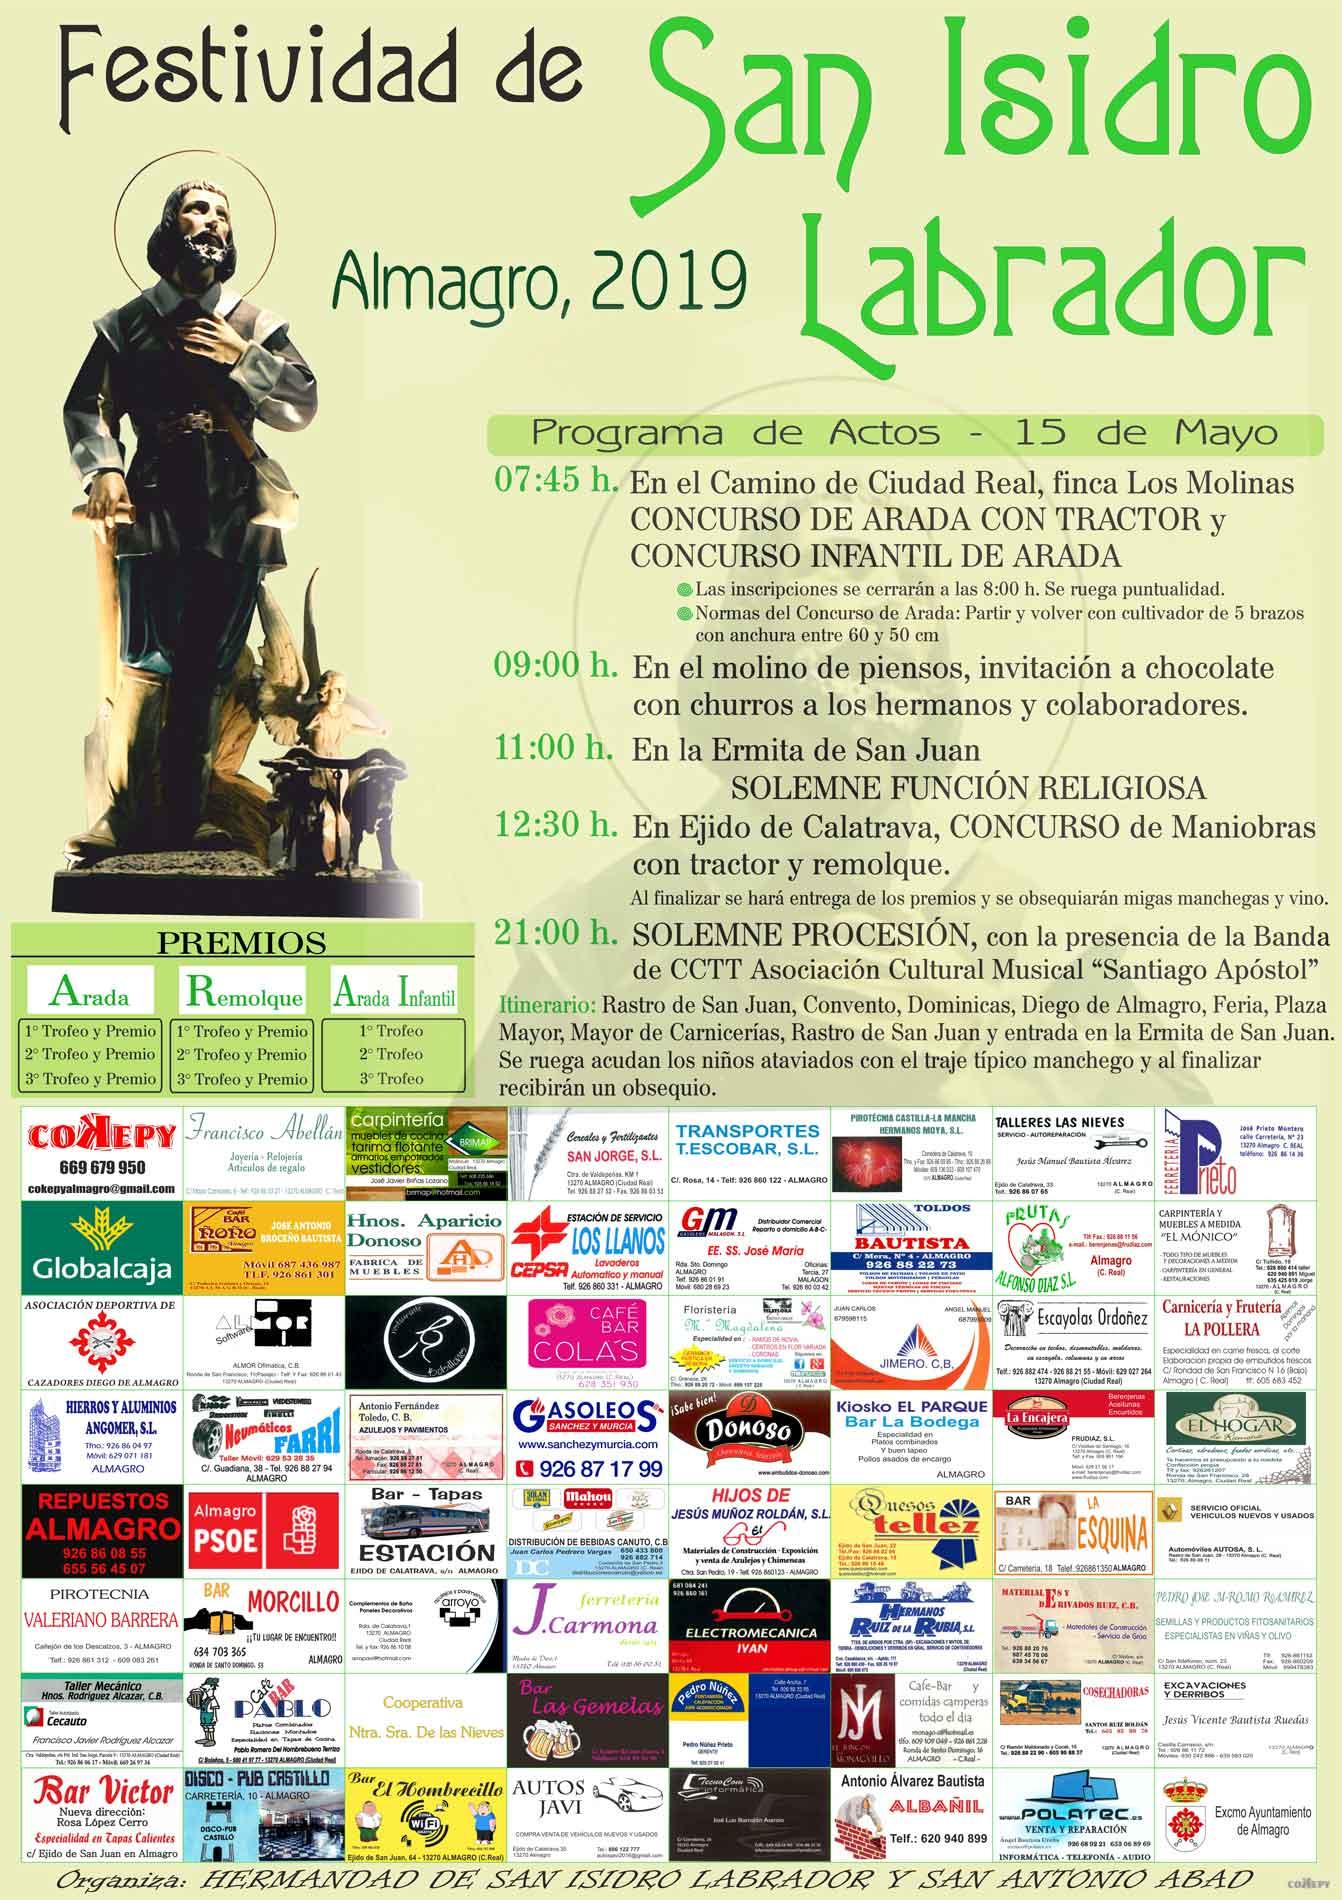 Festividad San Isidro Labrador